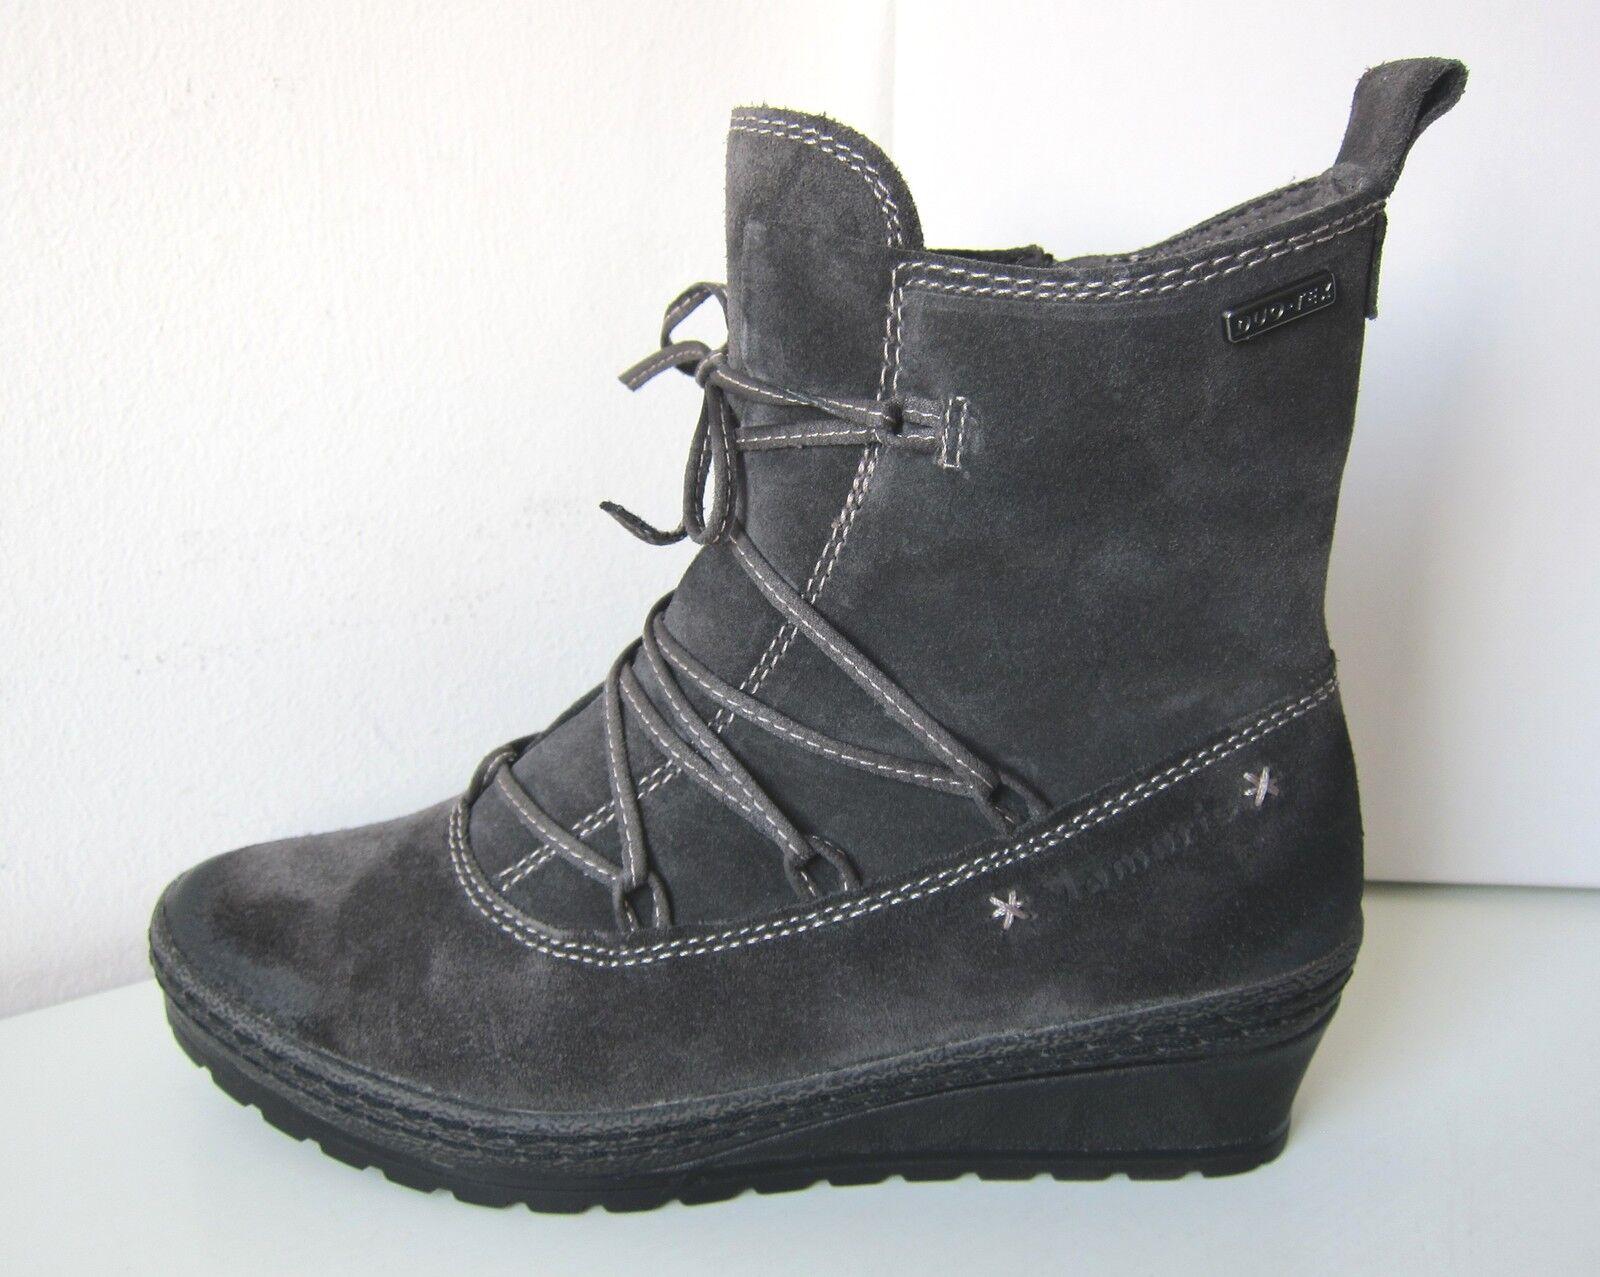 Keilabsatz Fellstiefel Stiefel warm grau  38 graphite Duo-Tex Tamaris Stiefel Grau